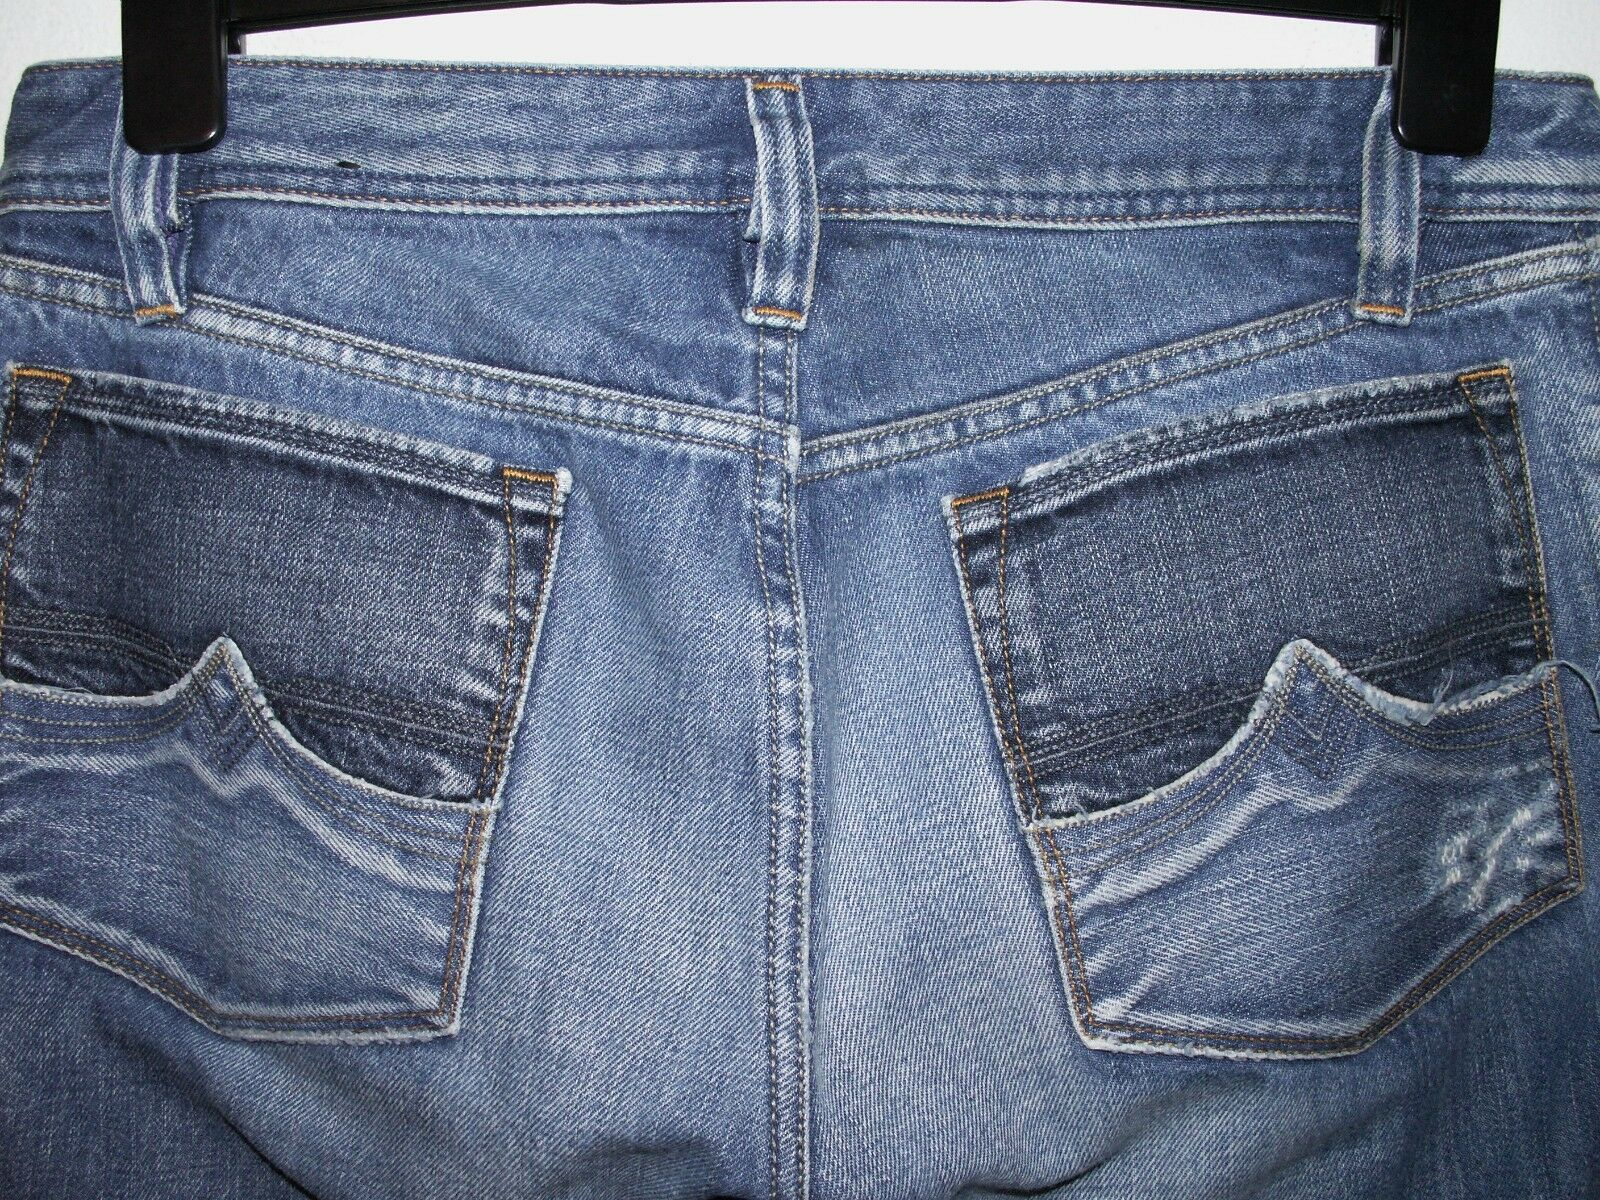 Diesel zaf bootcut jeans wash 00796 W32 L30 (a3893)